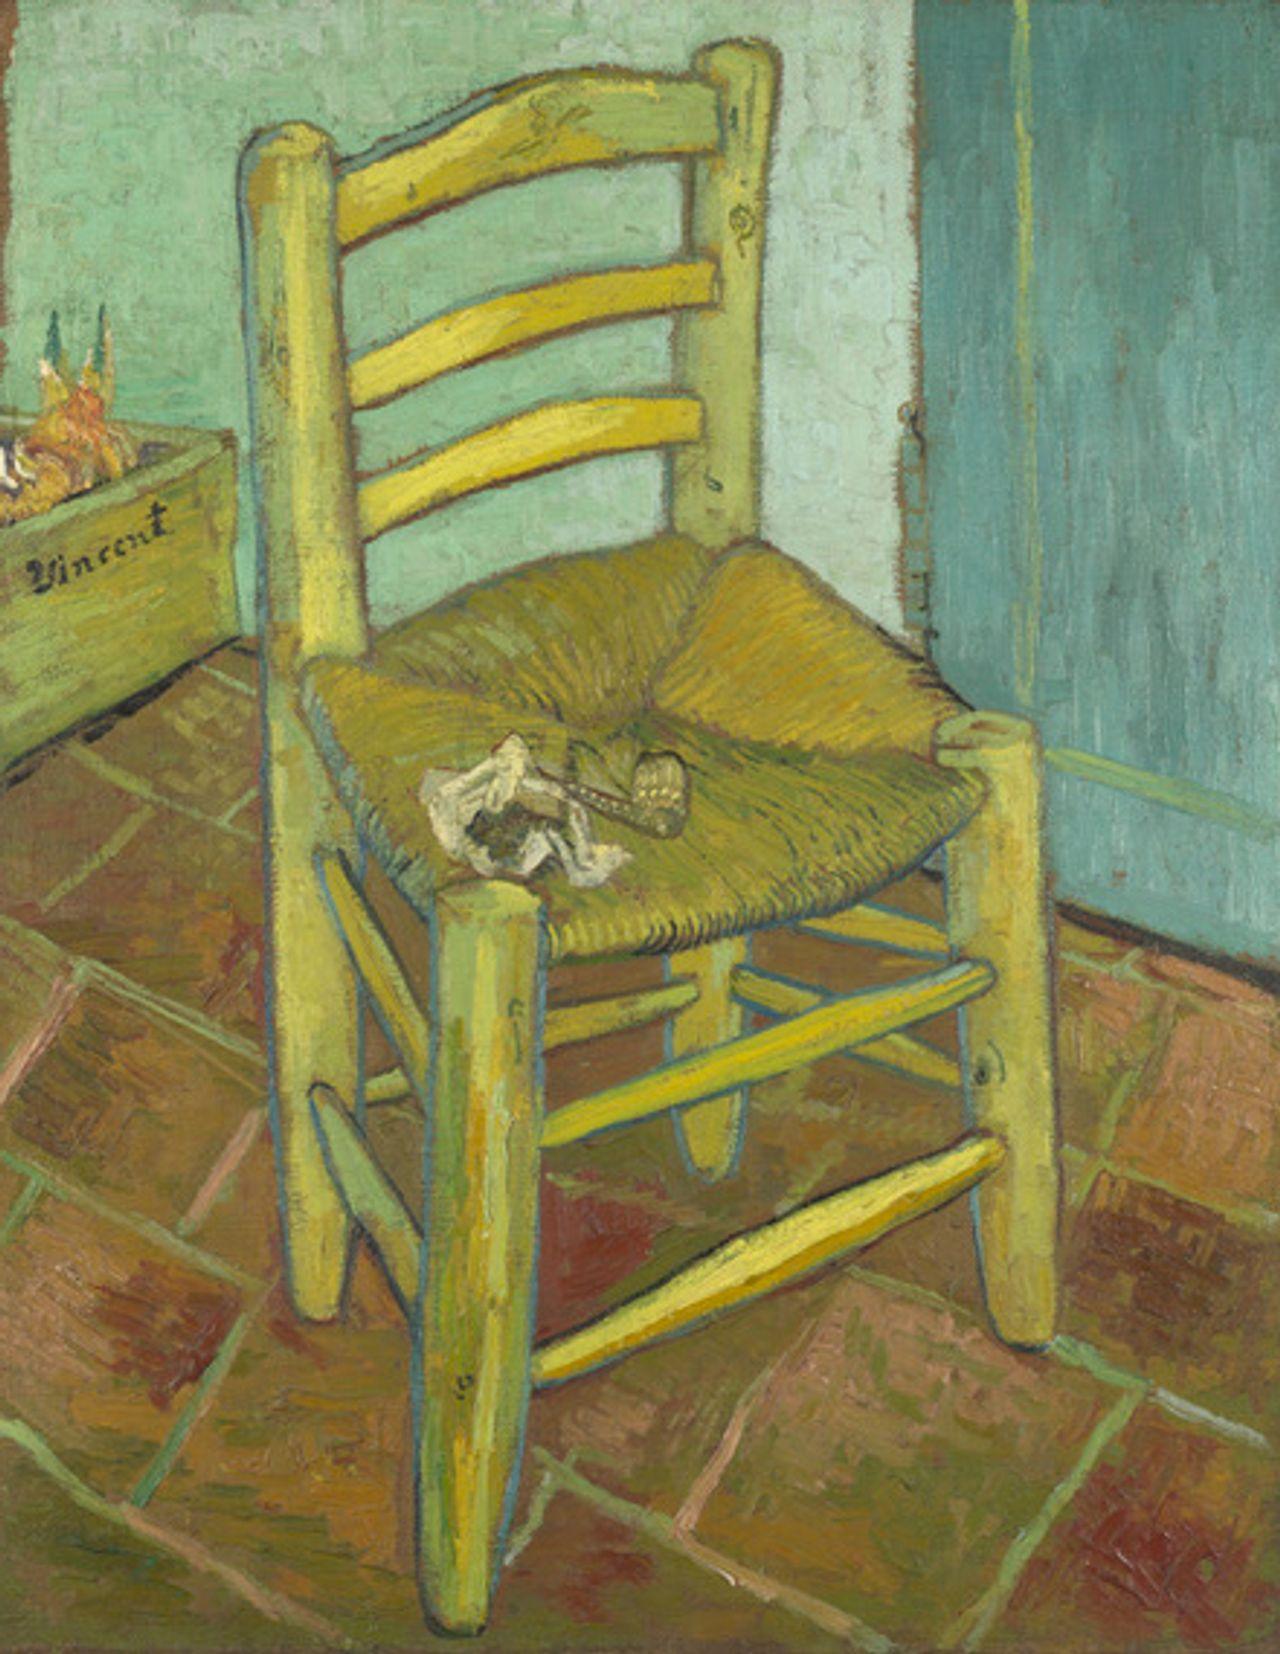 Vincent van Gogh, Van Gogh's Chair (1888-89) © National Gallery, London